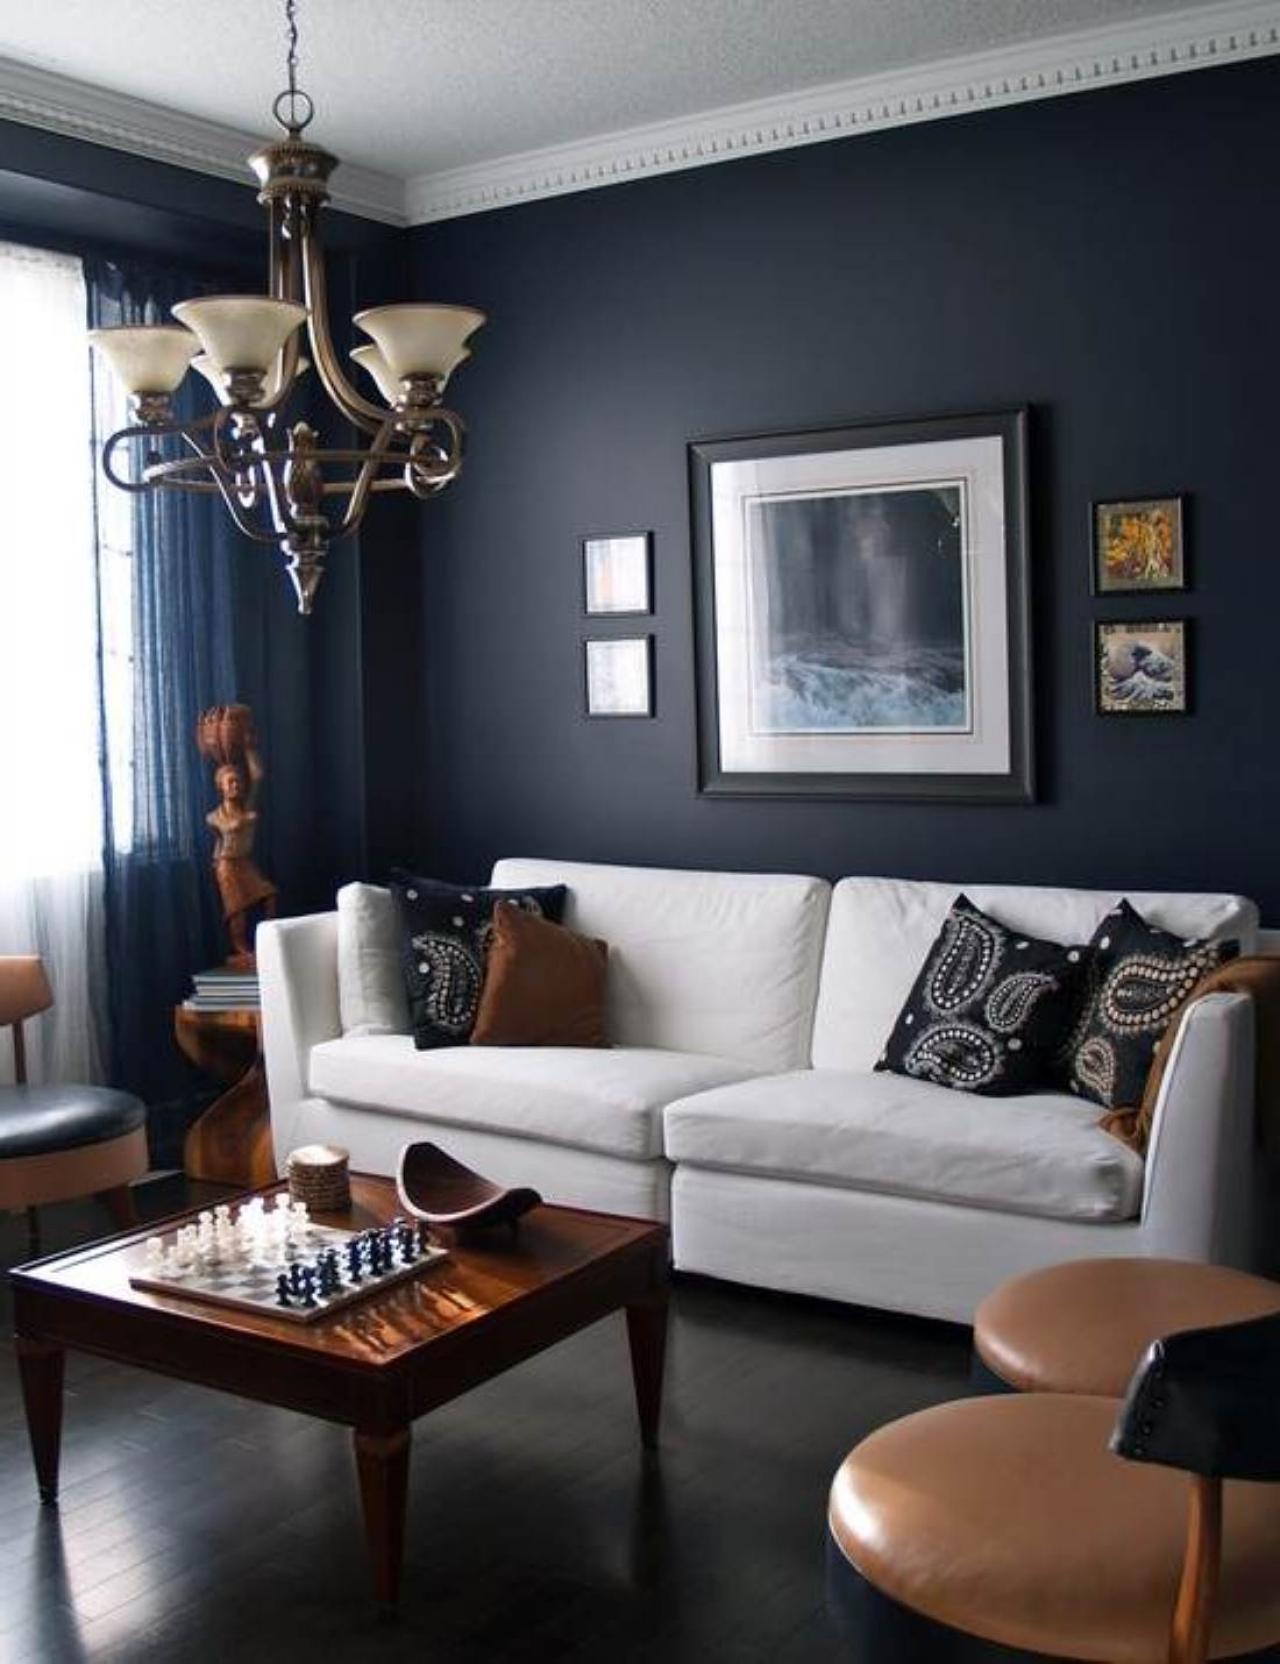 25 Simple Living Room Design Ideas To Get Inspired ... on Basic Room Ideas  id=79234